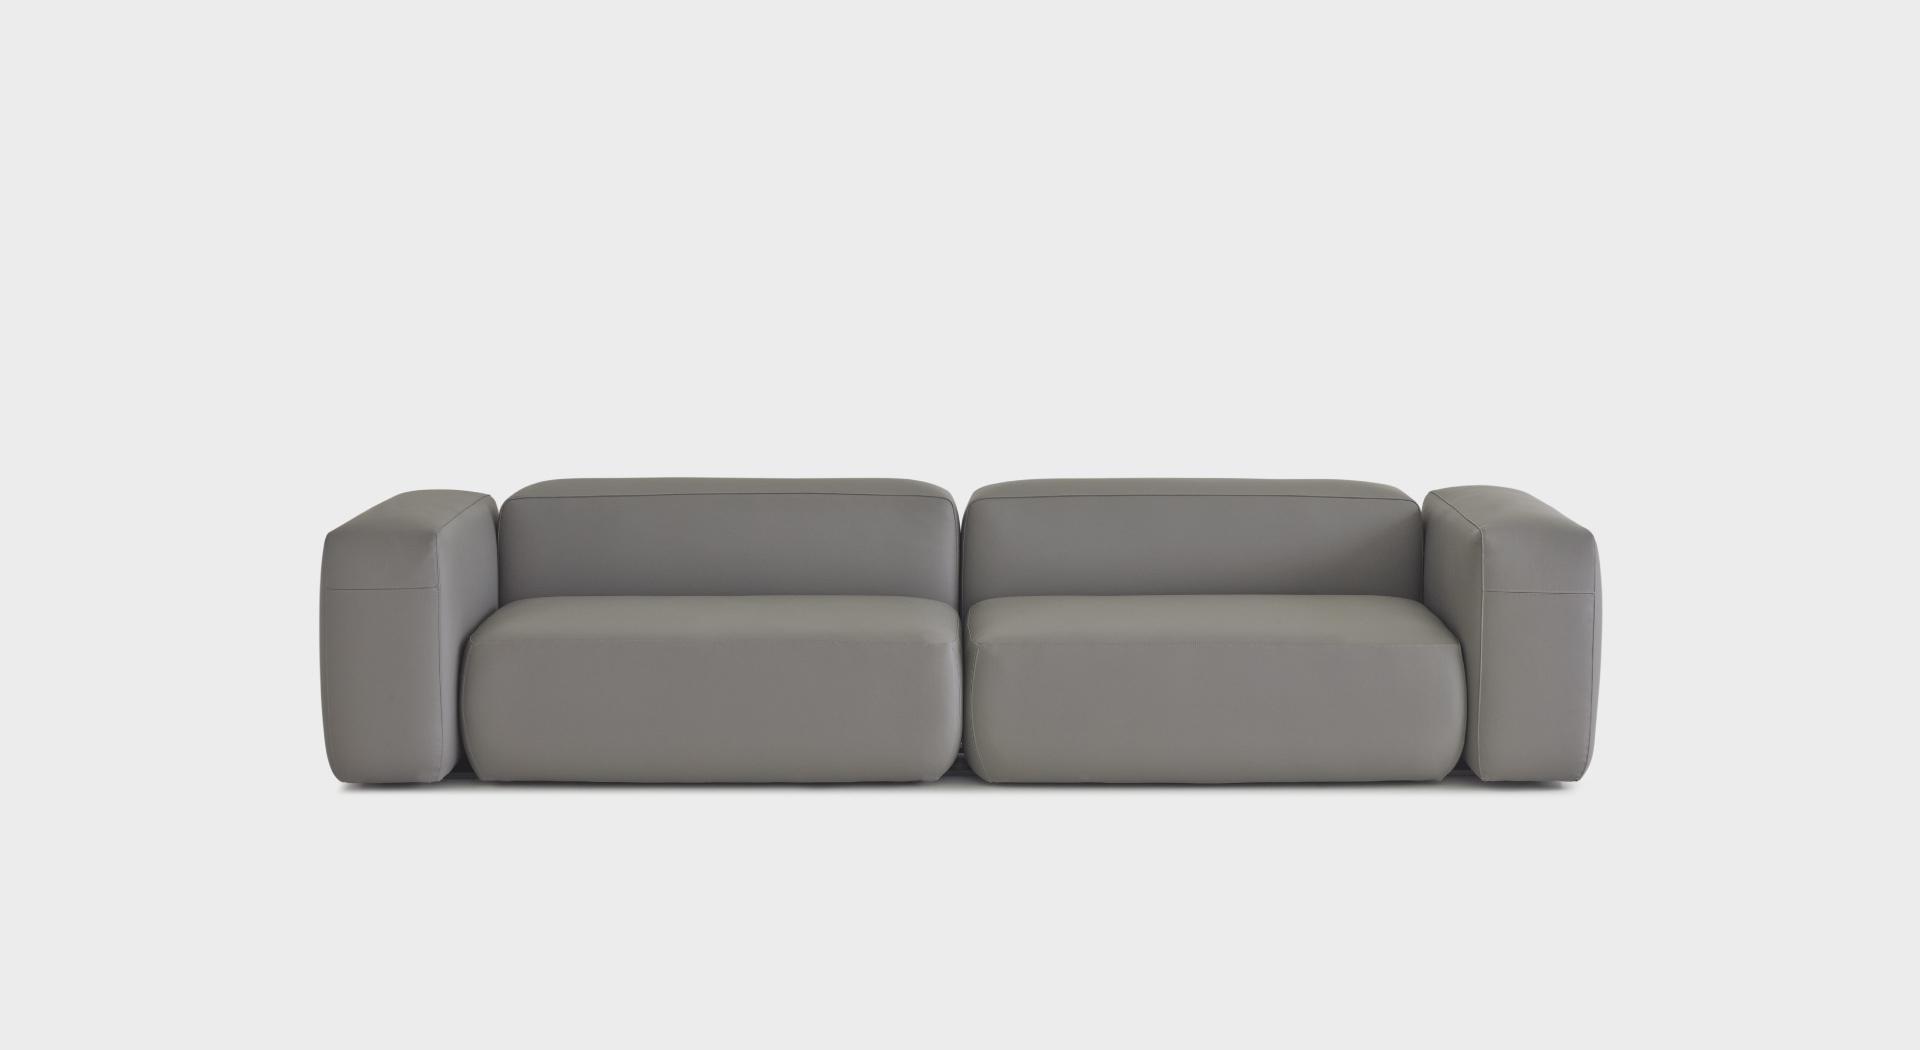 Full Size of Modulares Sofa Mit Schlaffunktion Lennon Westwing Kissen Modular Set Flex Dhel Leder System Ikea Plus Classic Zwei Sitzflchen Armlehnen Englisch L Sofa Modulares Sofa